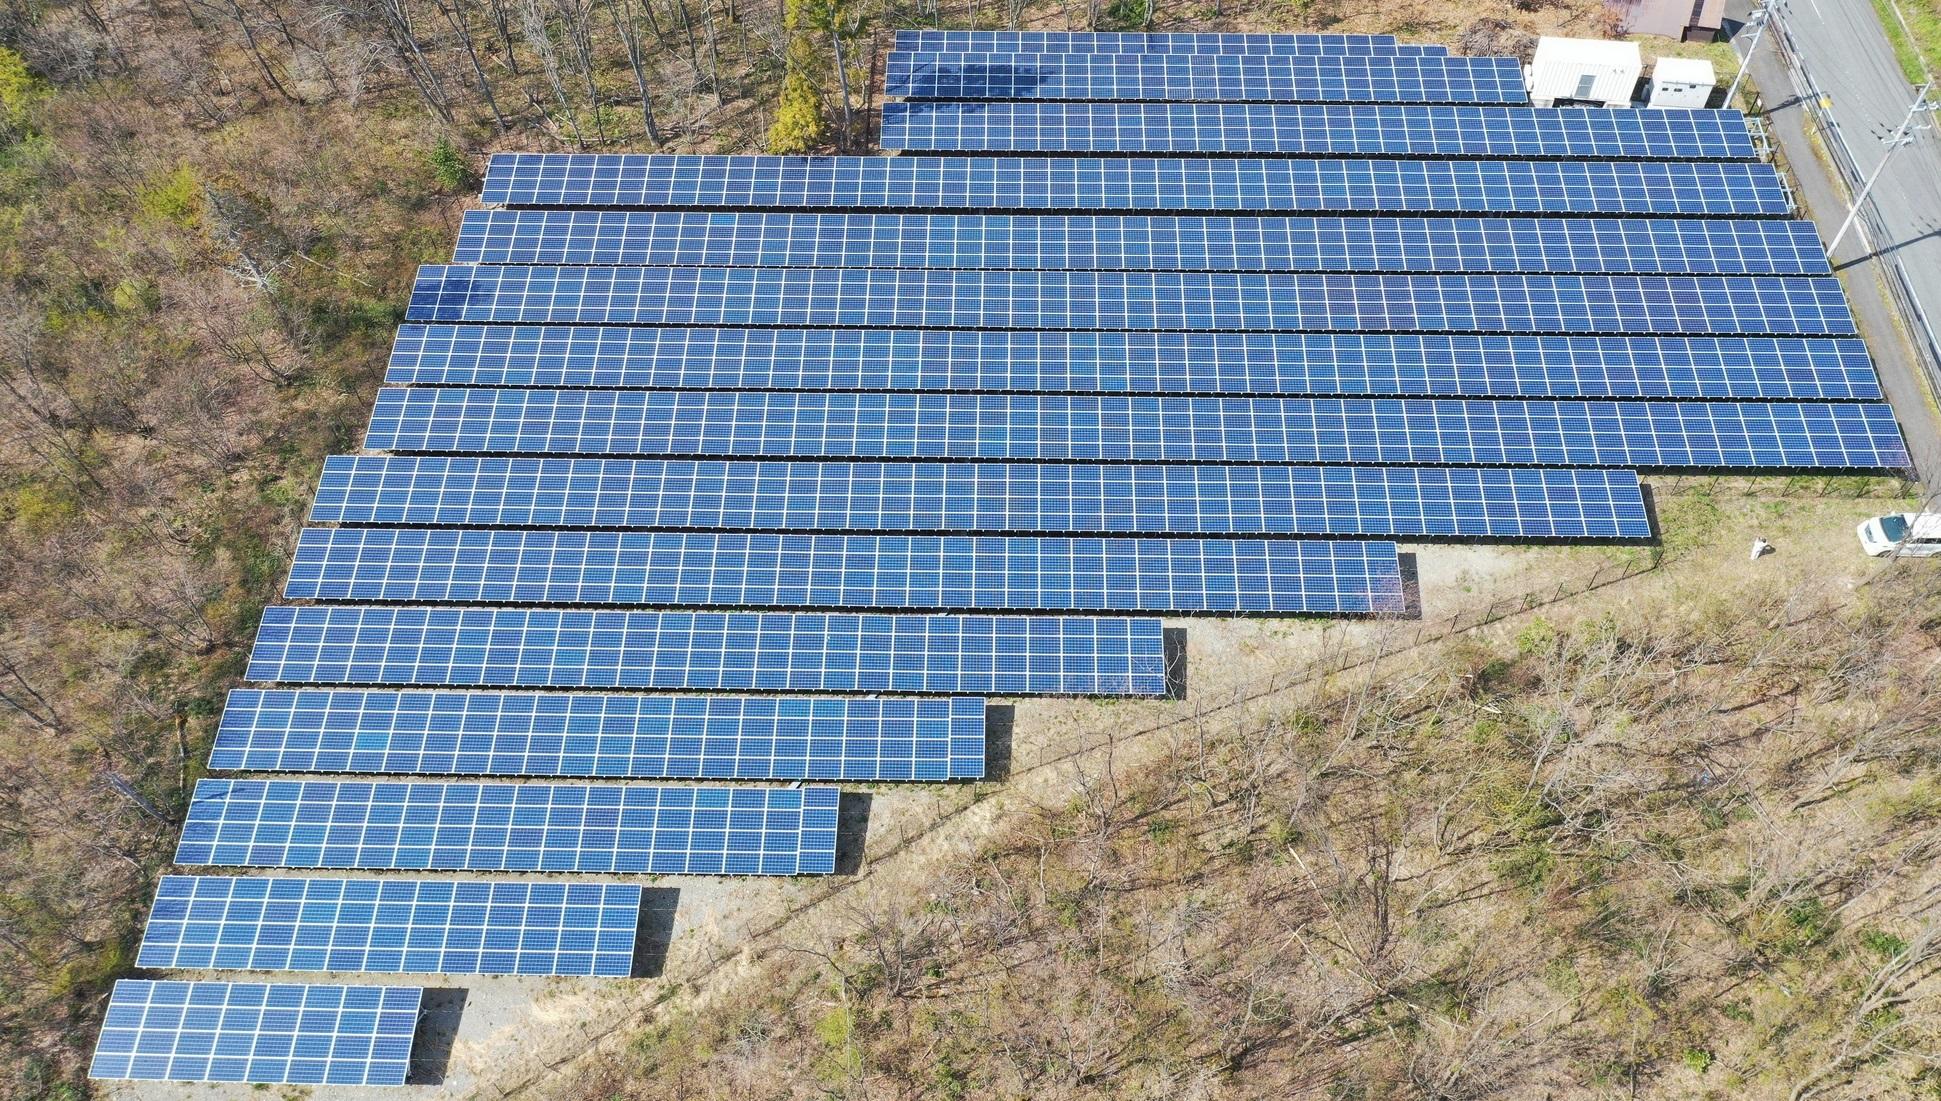 LP滋賀県高島市マキノ太陽光発電所